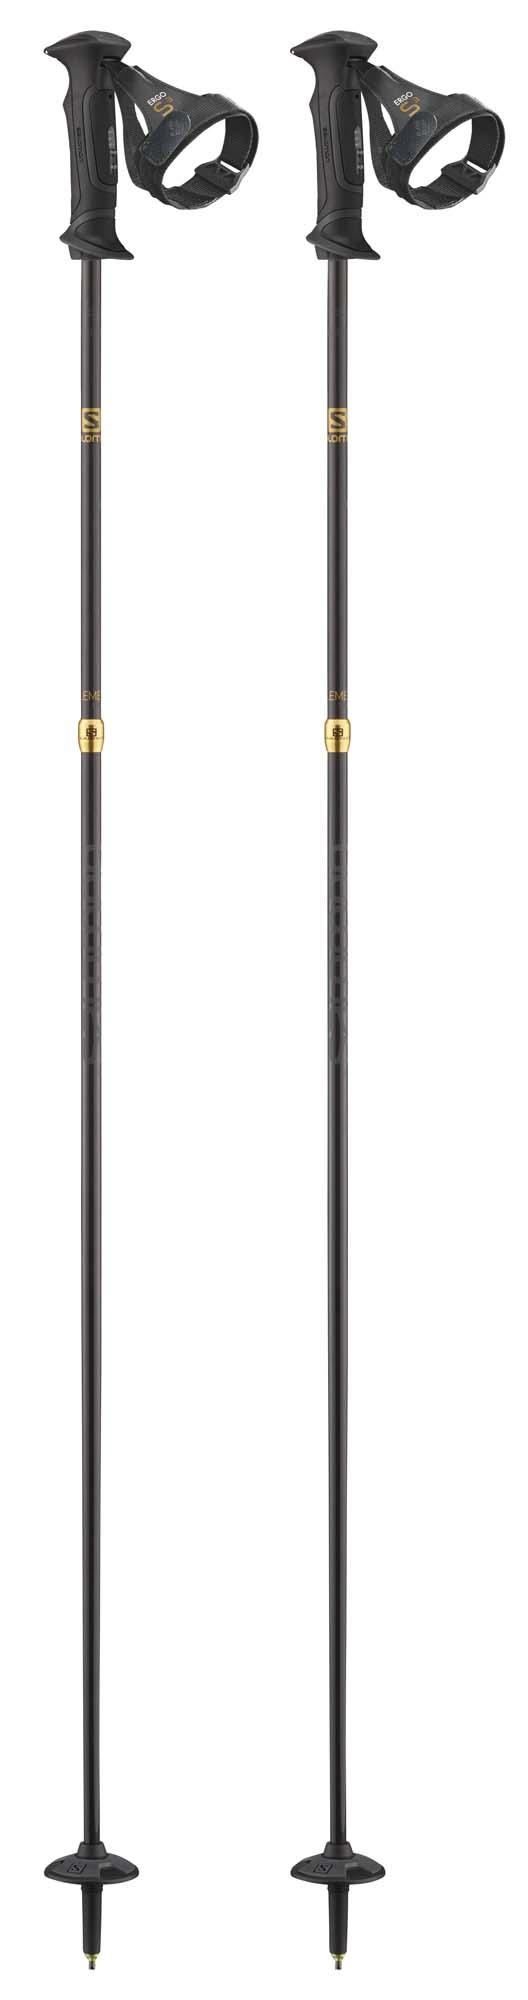 Salomon 2021 Element Carbon Ergo S3 Ski Poles NEW !! 120,125,130cm